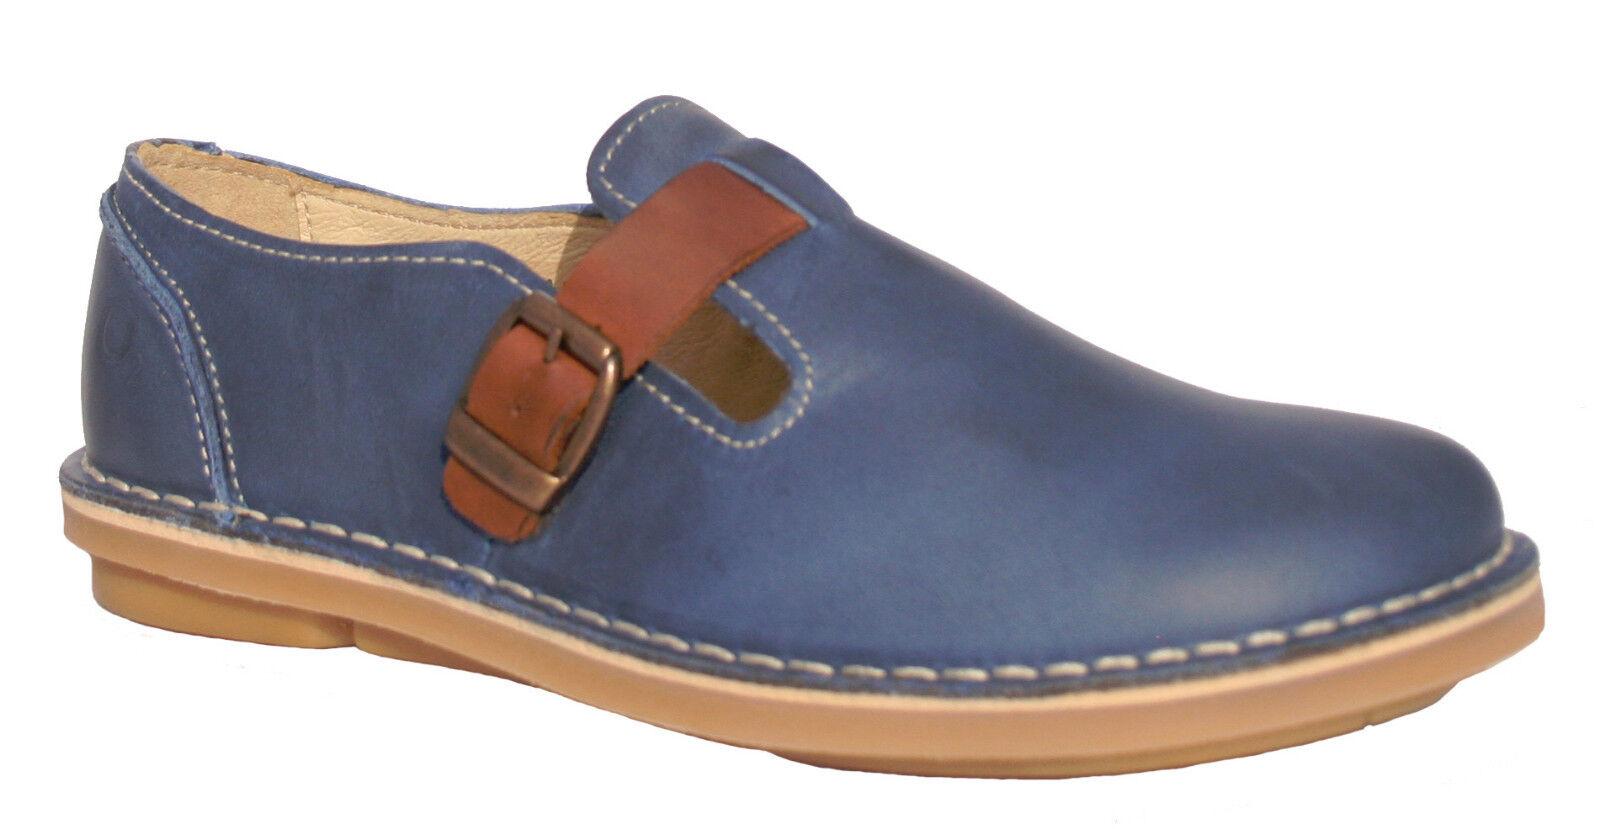 Oxygen Stitch Down 36 T Bar Schuhe CASCAIS Blau Größes 36 Down to 41 (UK 3-7.5) 231829